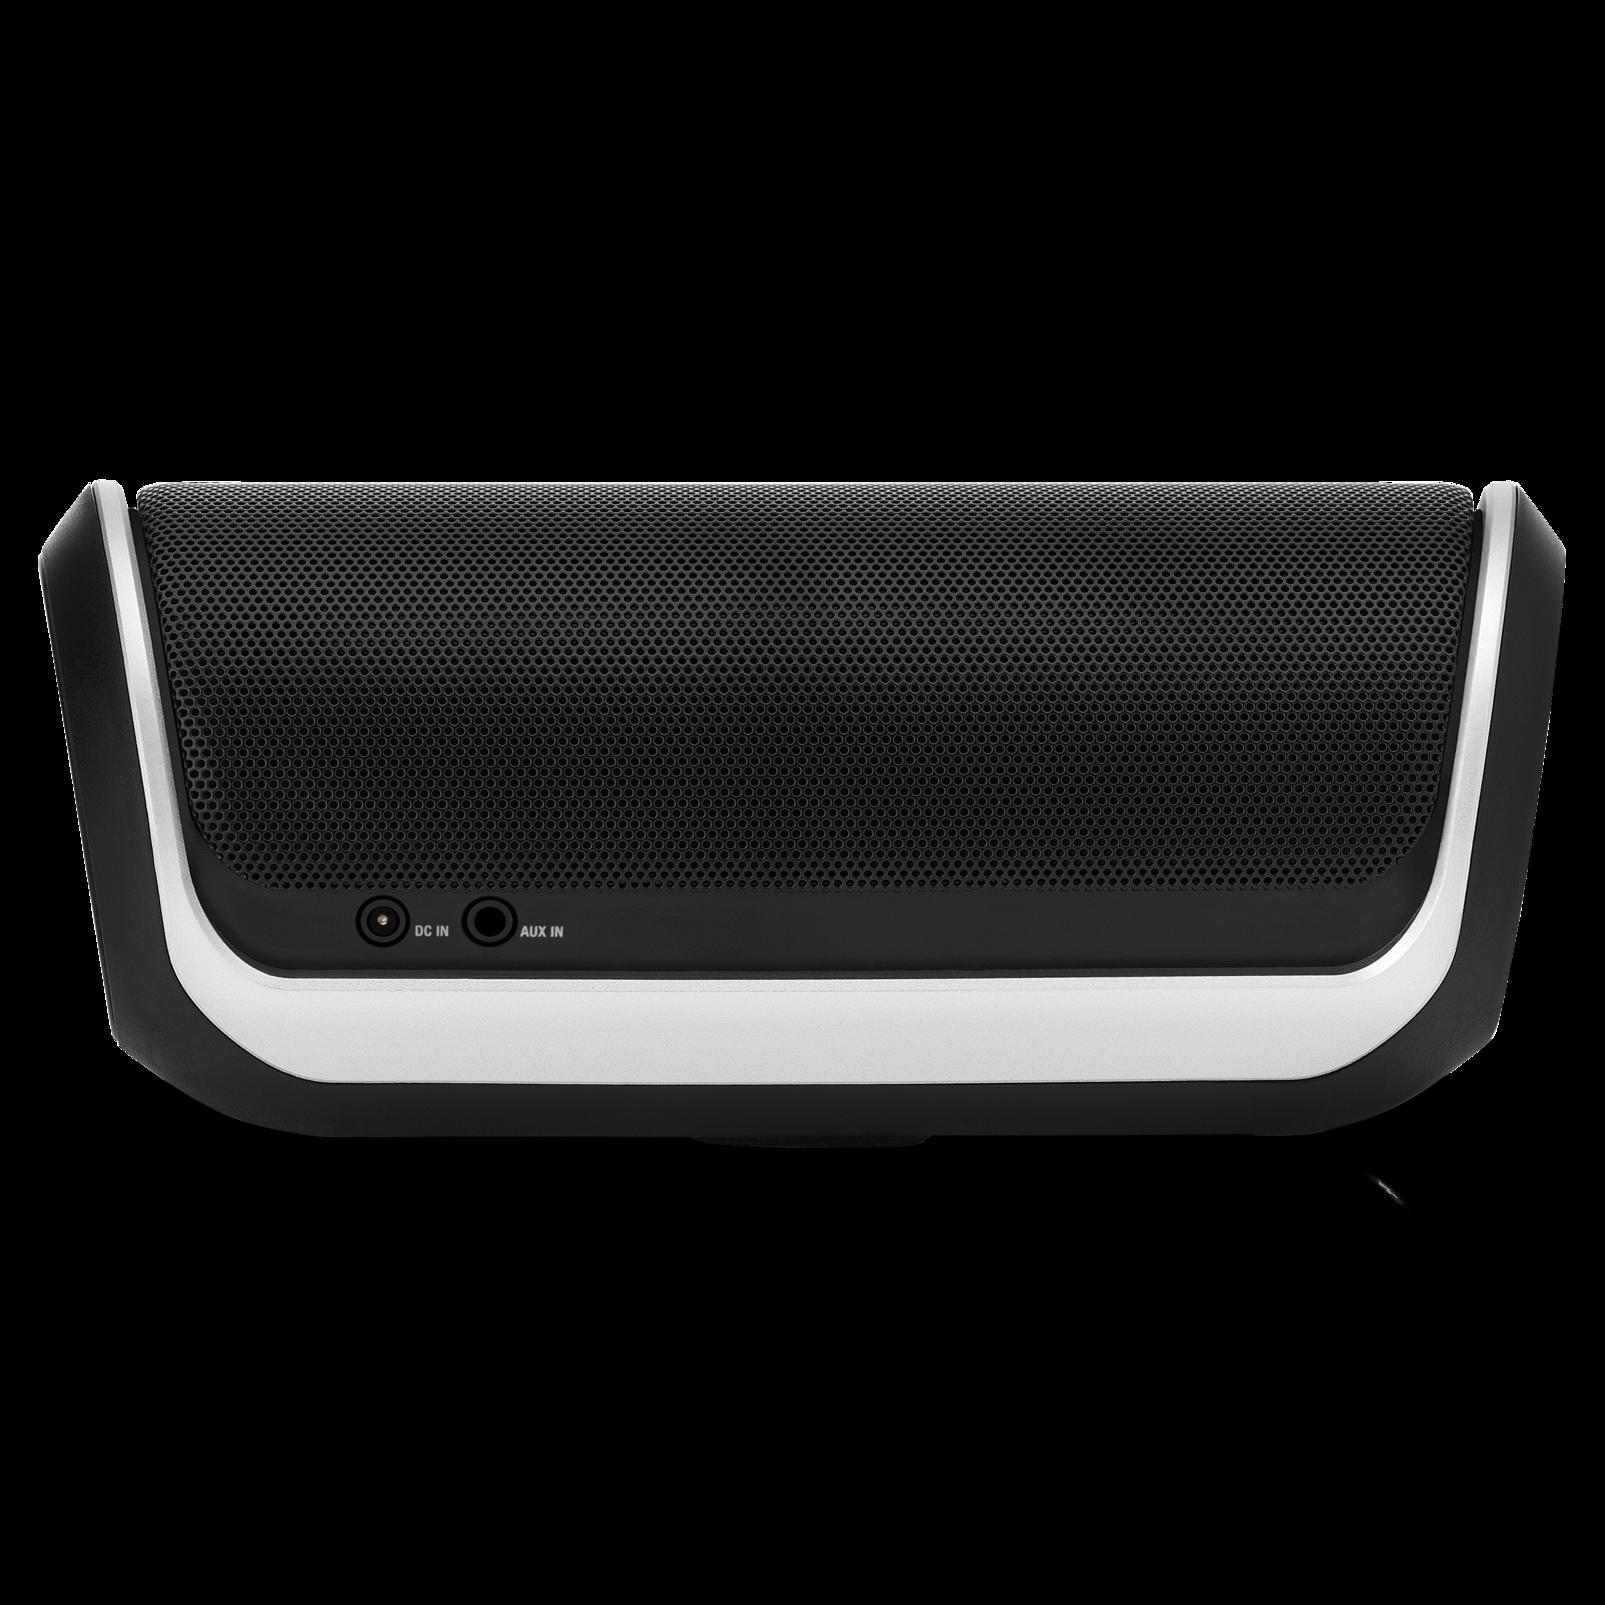 Jbl Flip Bluetooth Speaker With Microphone Valor Radio Wiring Harness Diagram